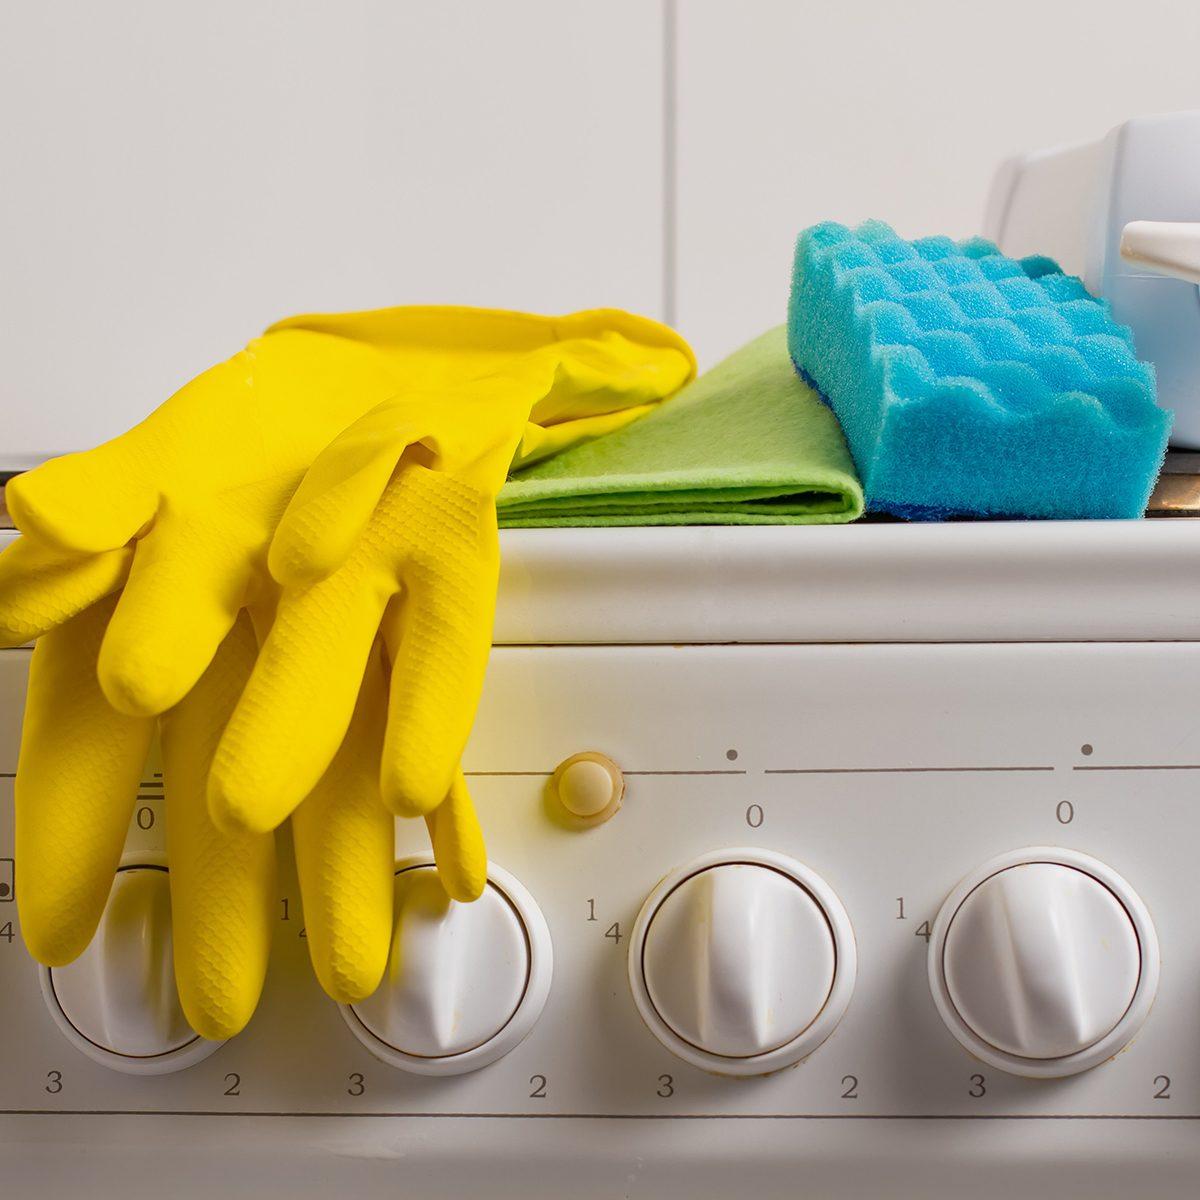 Kitchen cleaning supplies